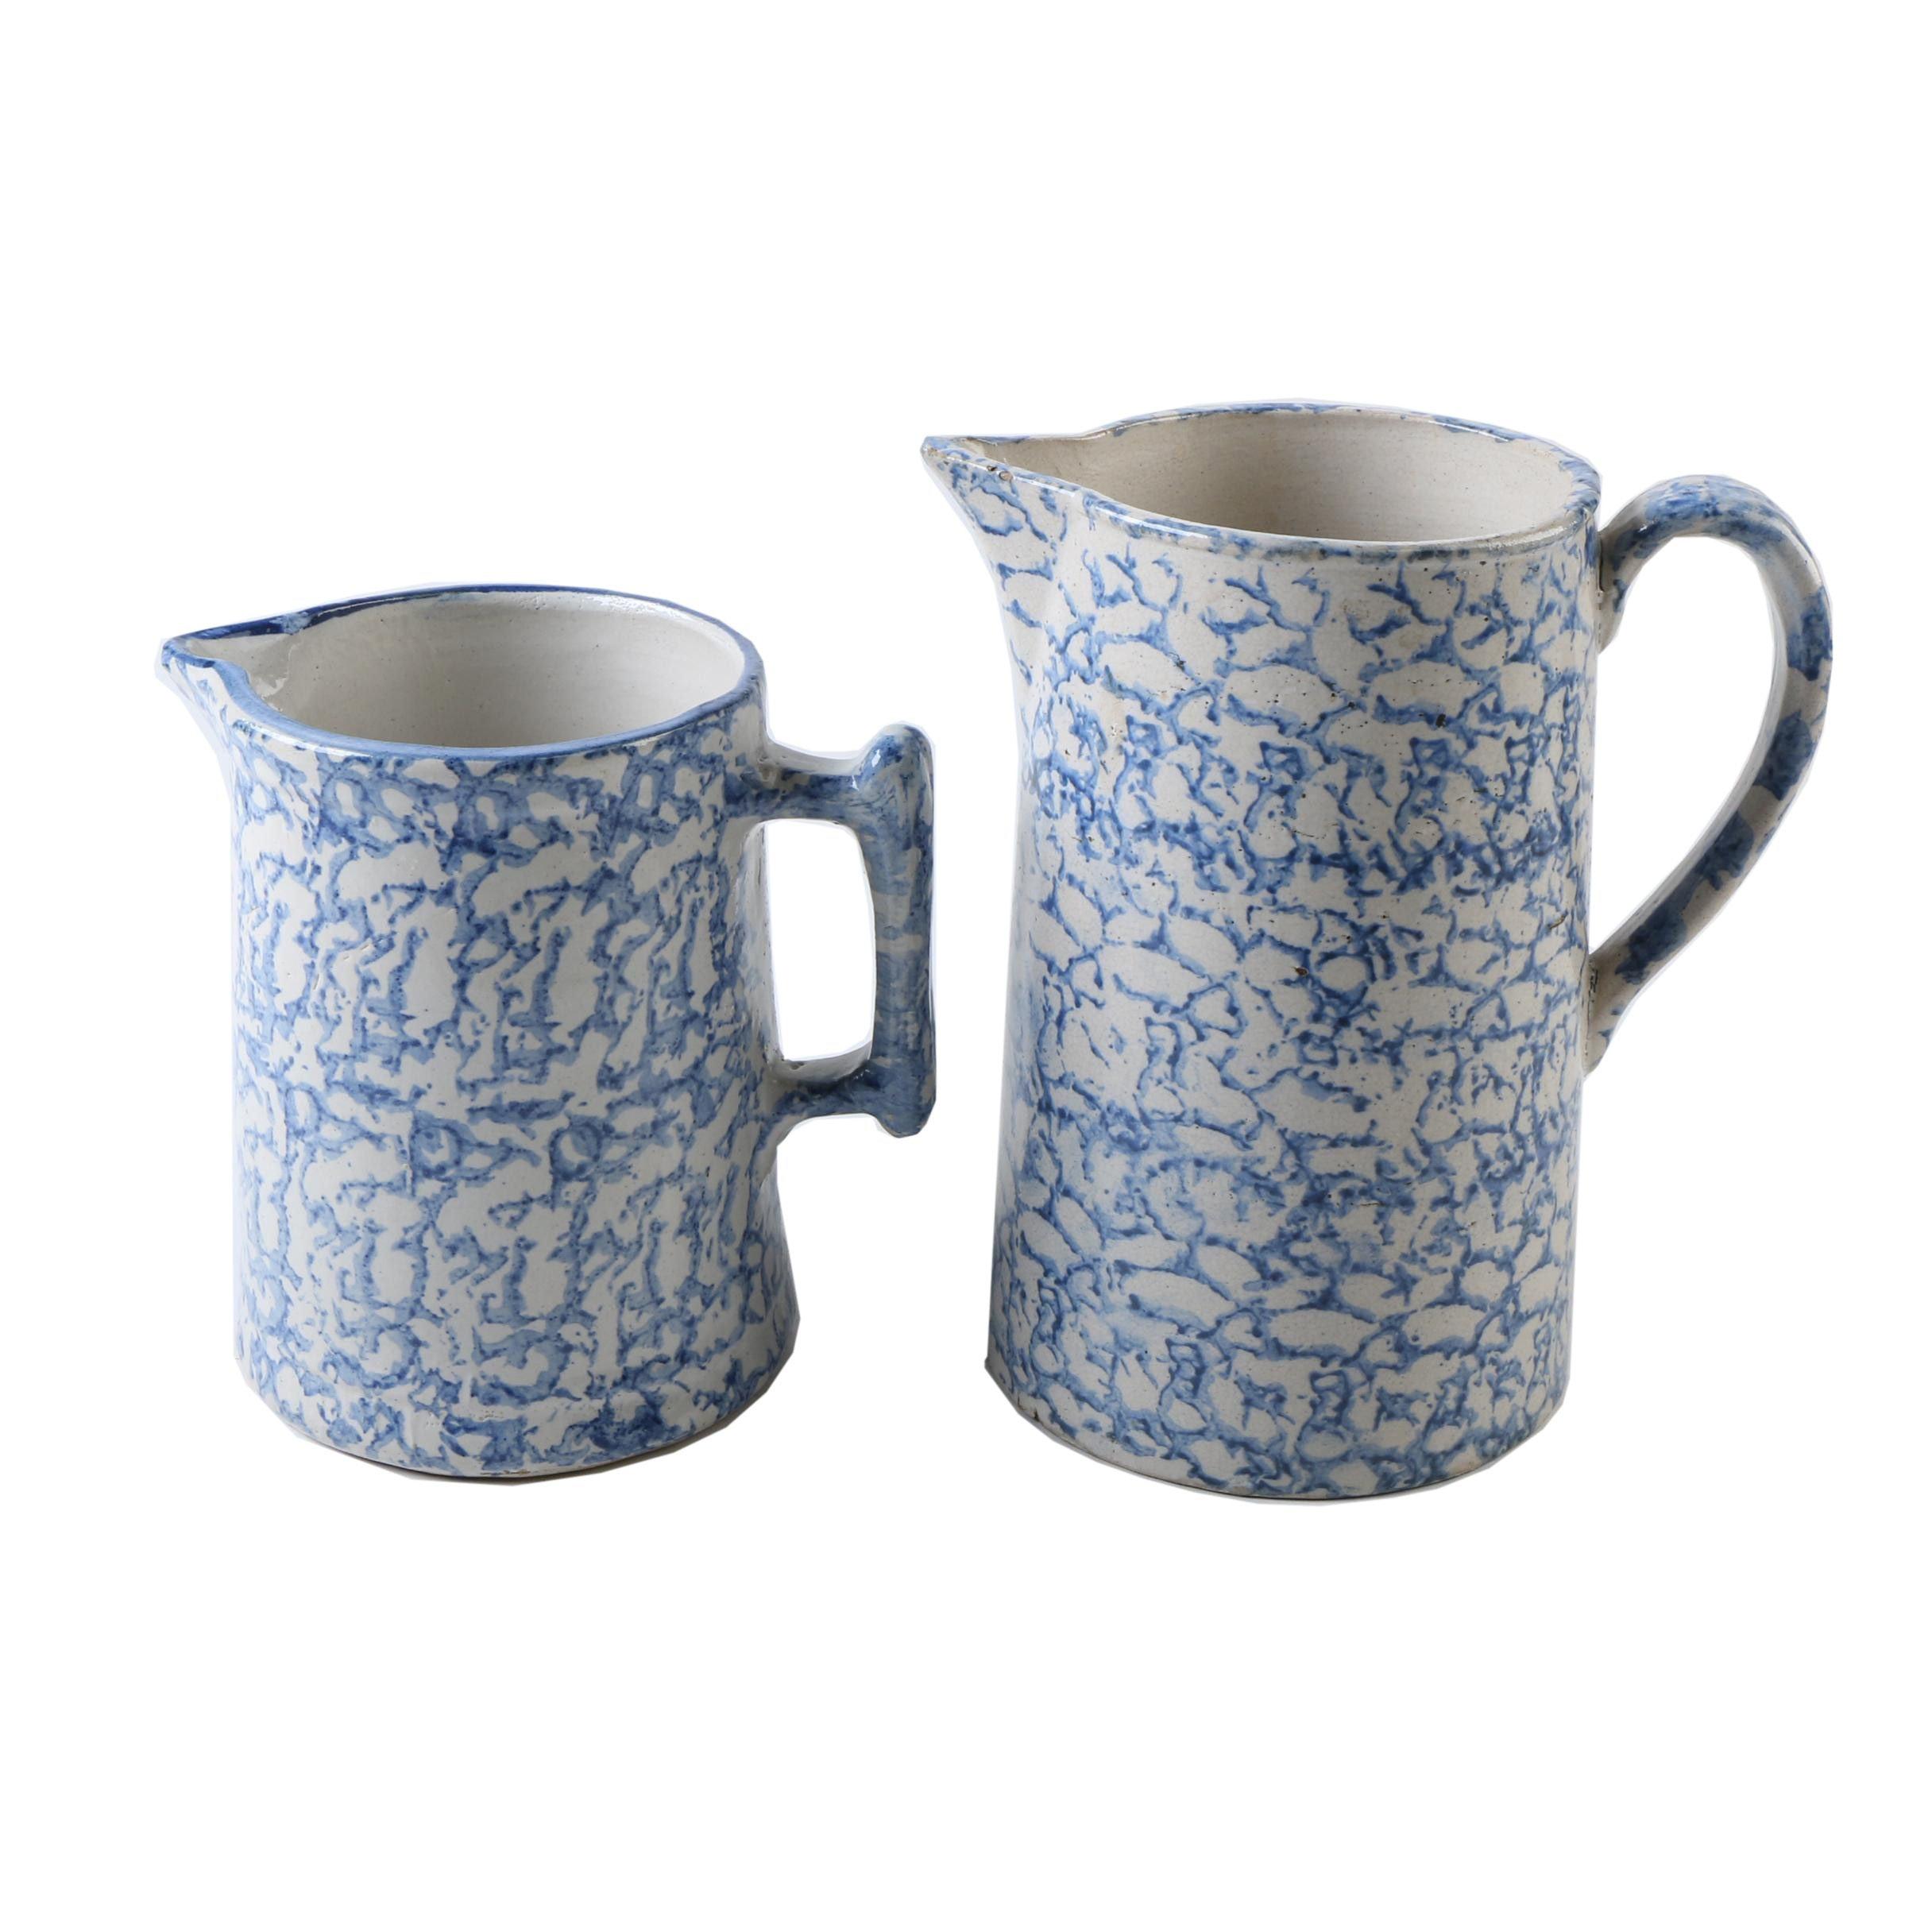 Vintage Stoneware Spongeware Pitchers